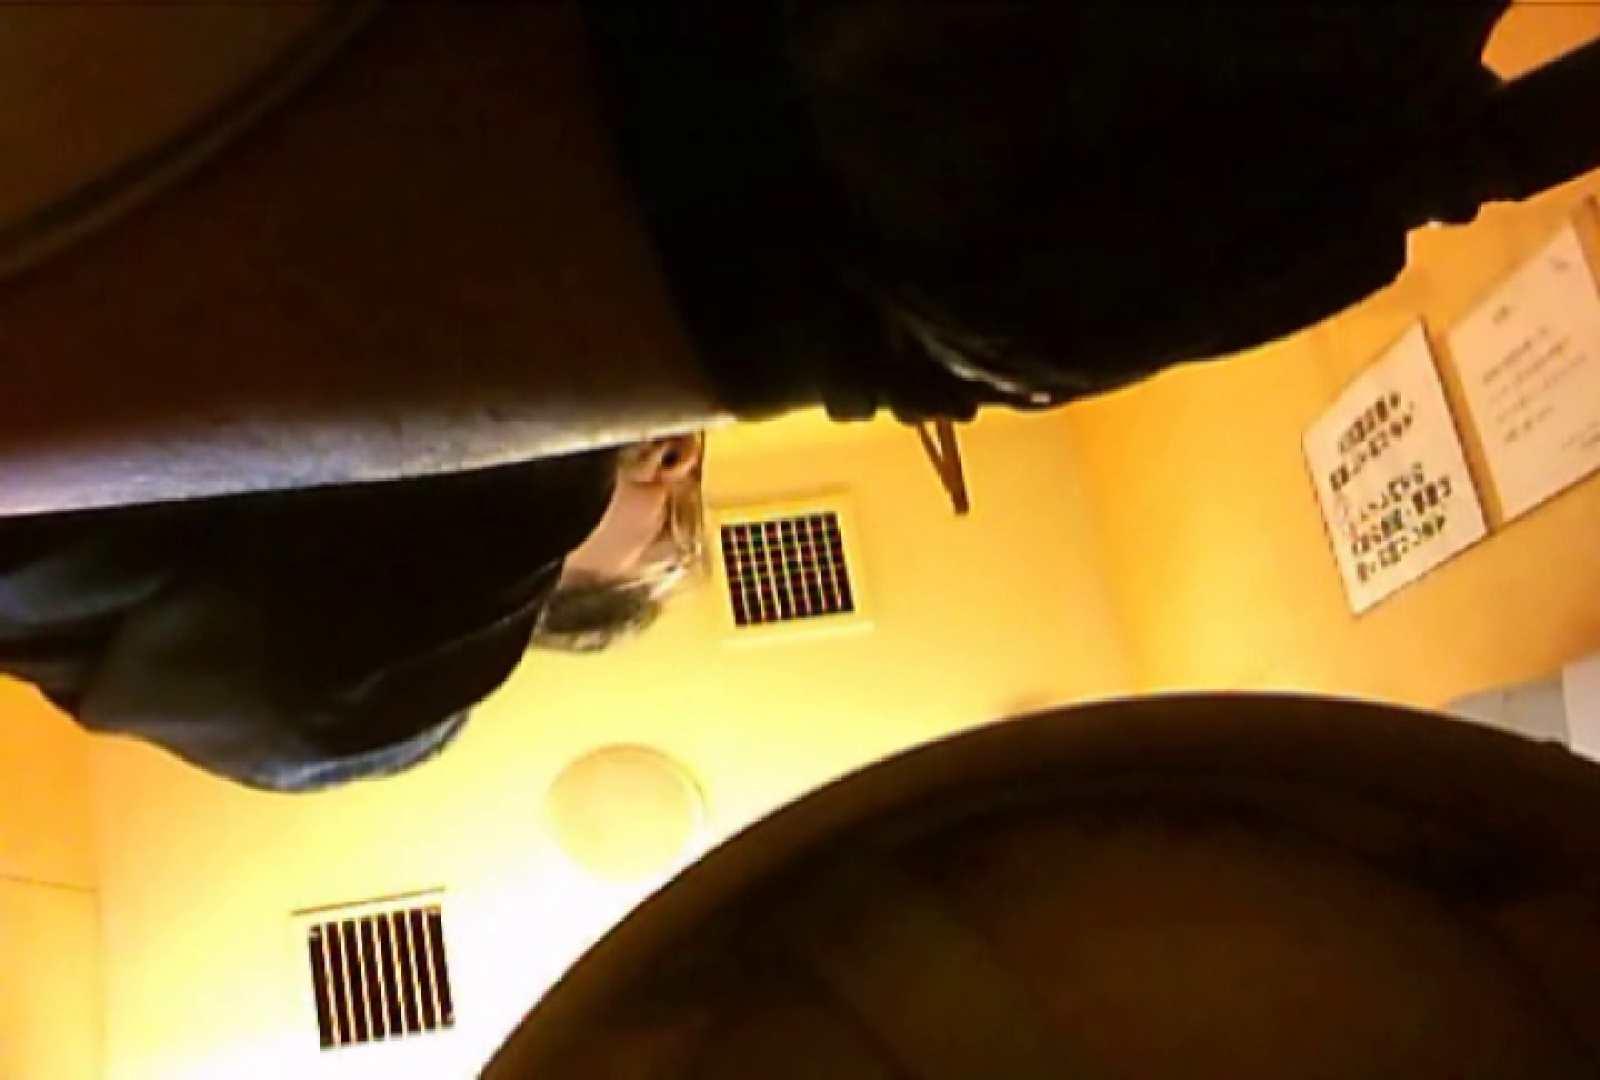 SEASON 2ND!掴み取りさんの洗面所覗き!in新幹線!VOL.02 リーマン系な男たち ゲイSEX画像 80連発 8